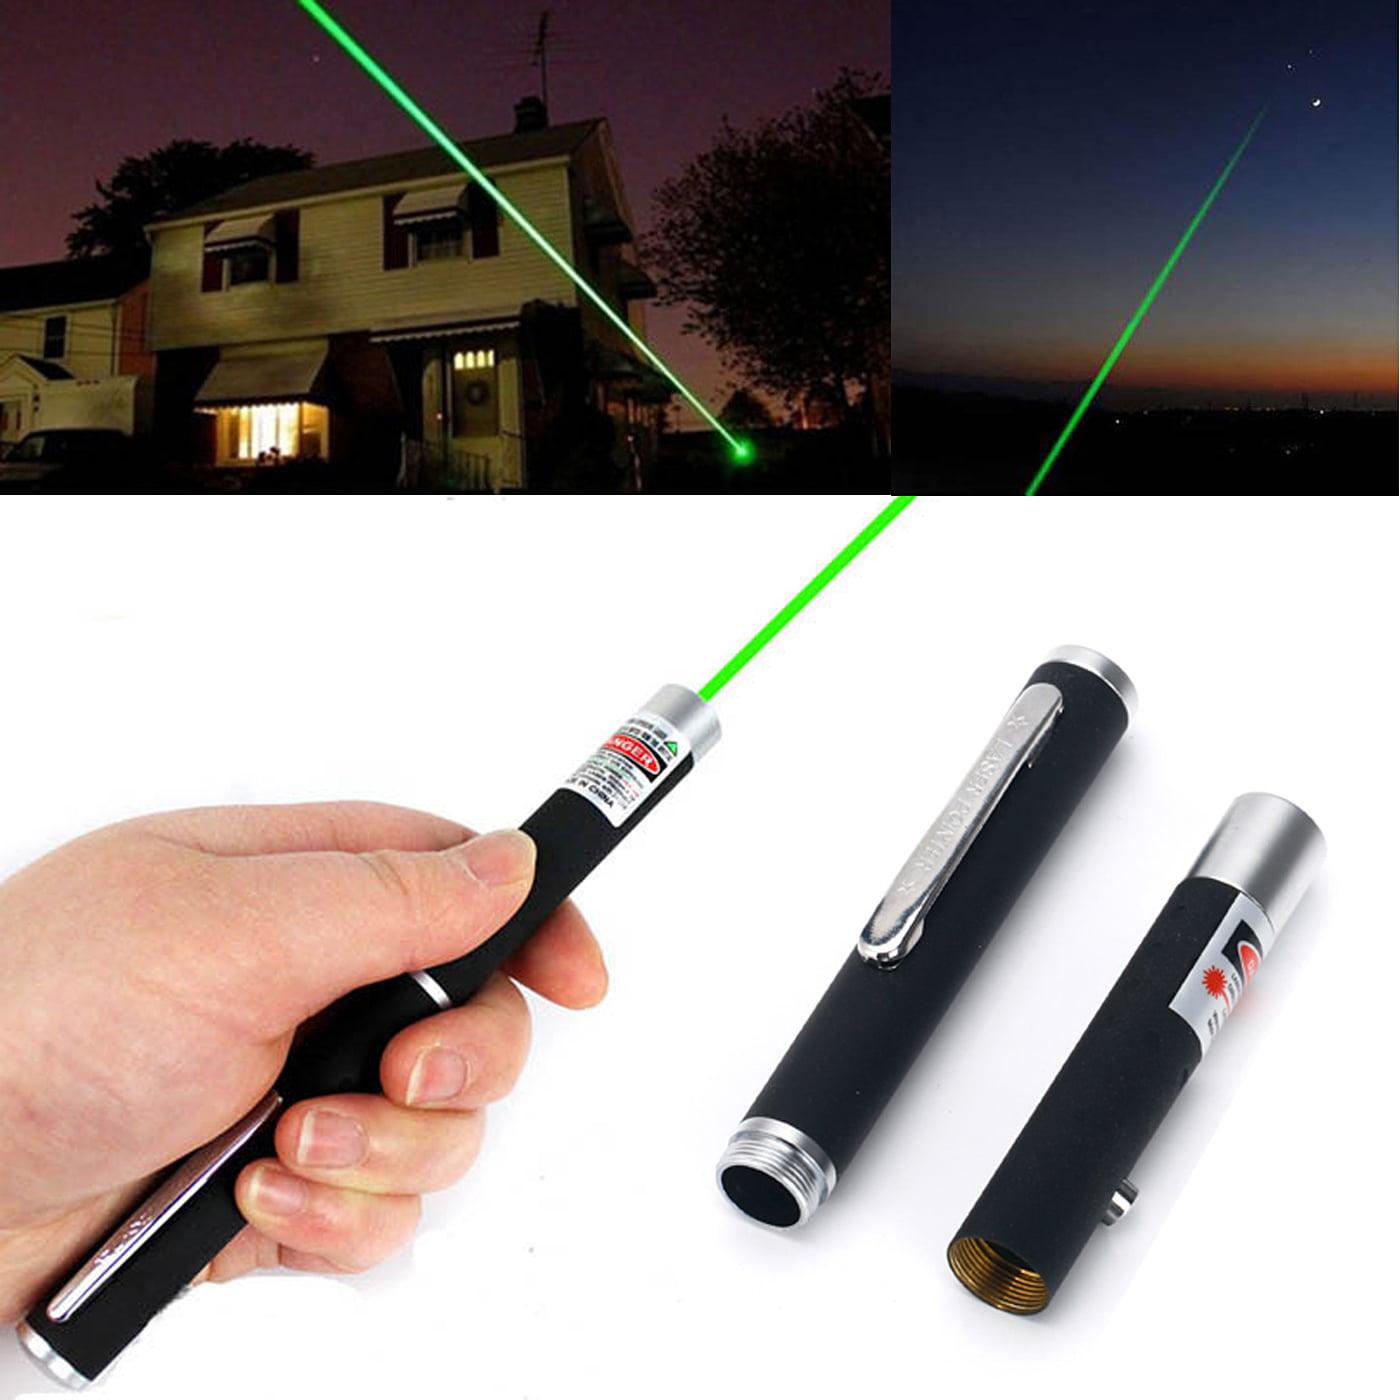 Hde Green Laser Pointer